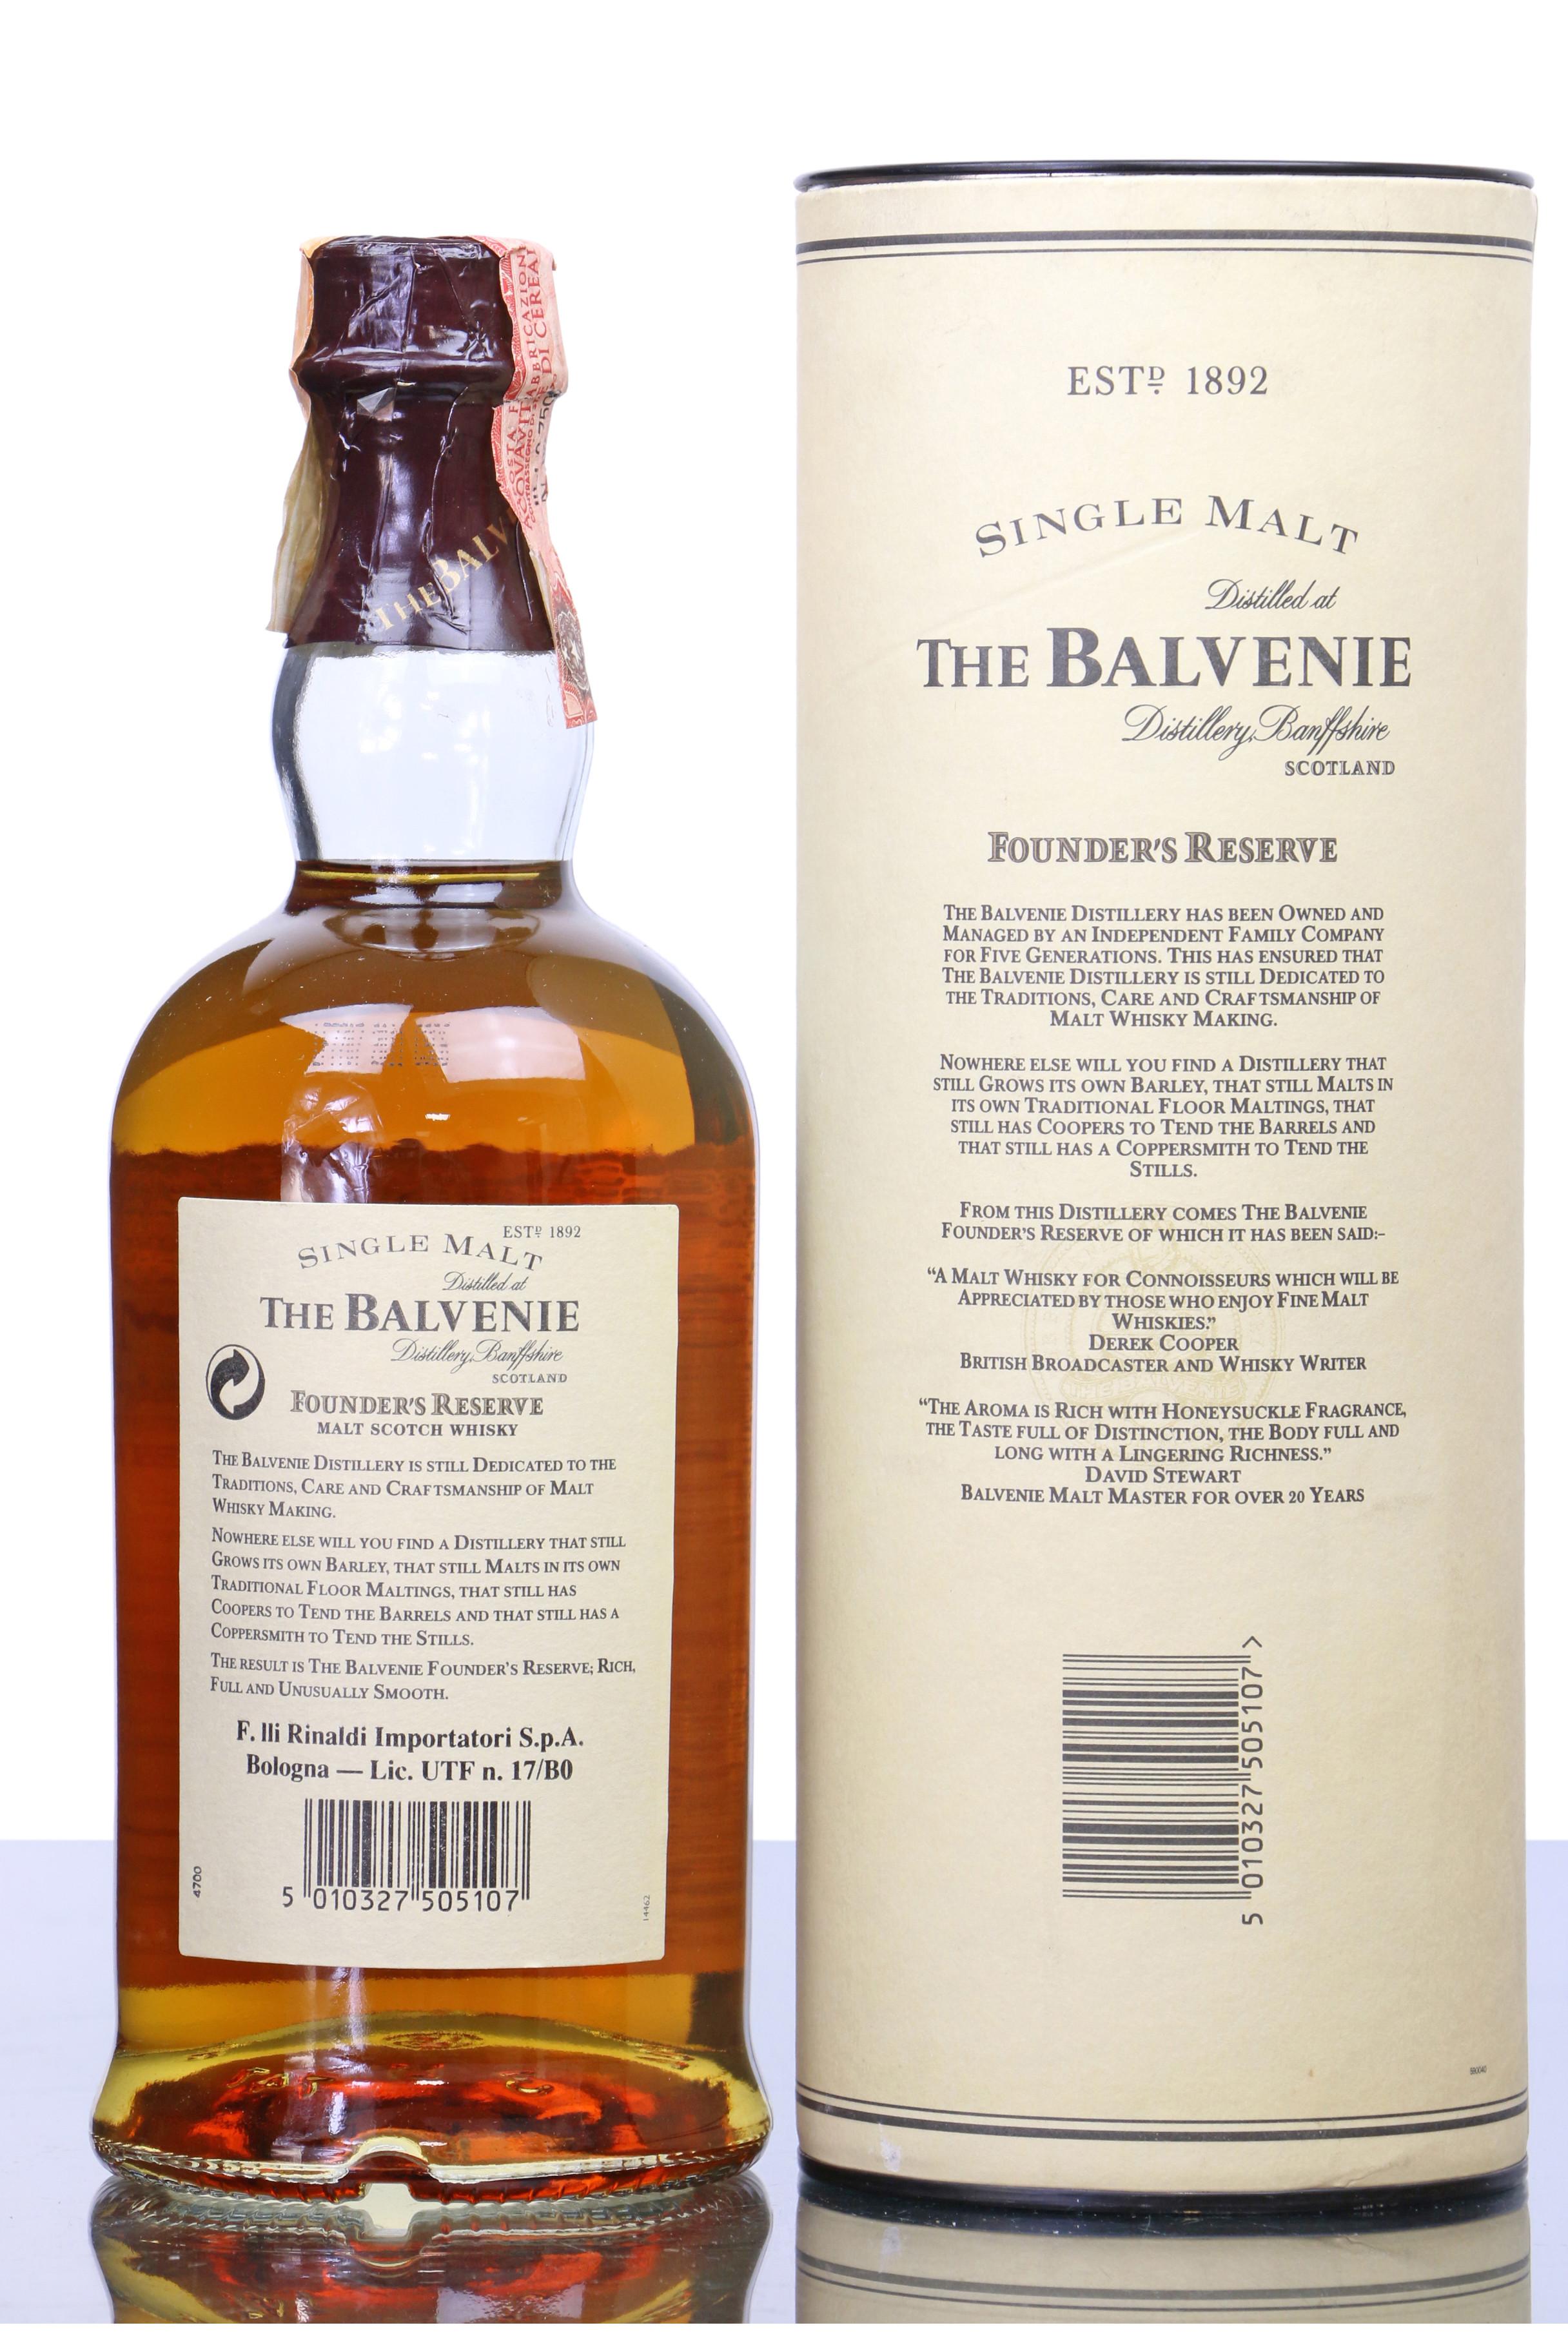 Balvenie single malt founders reserve